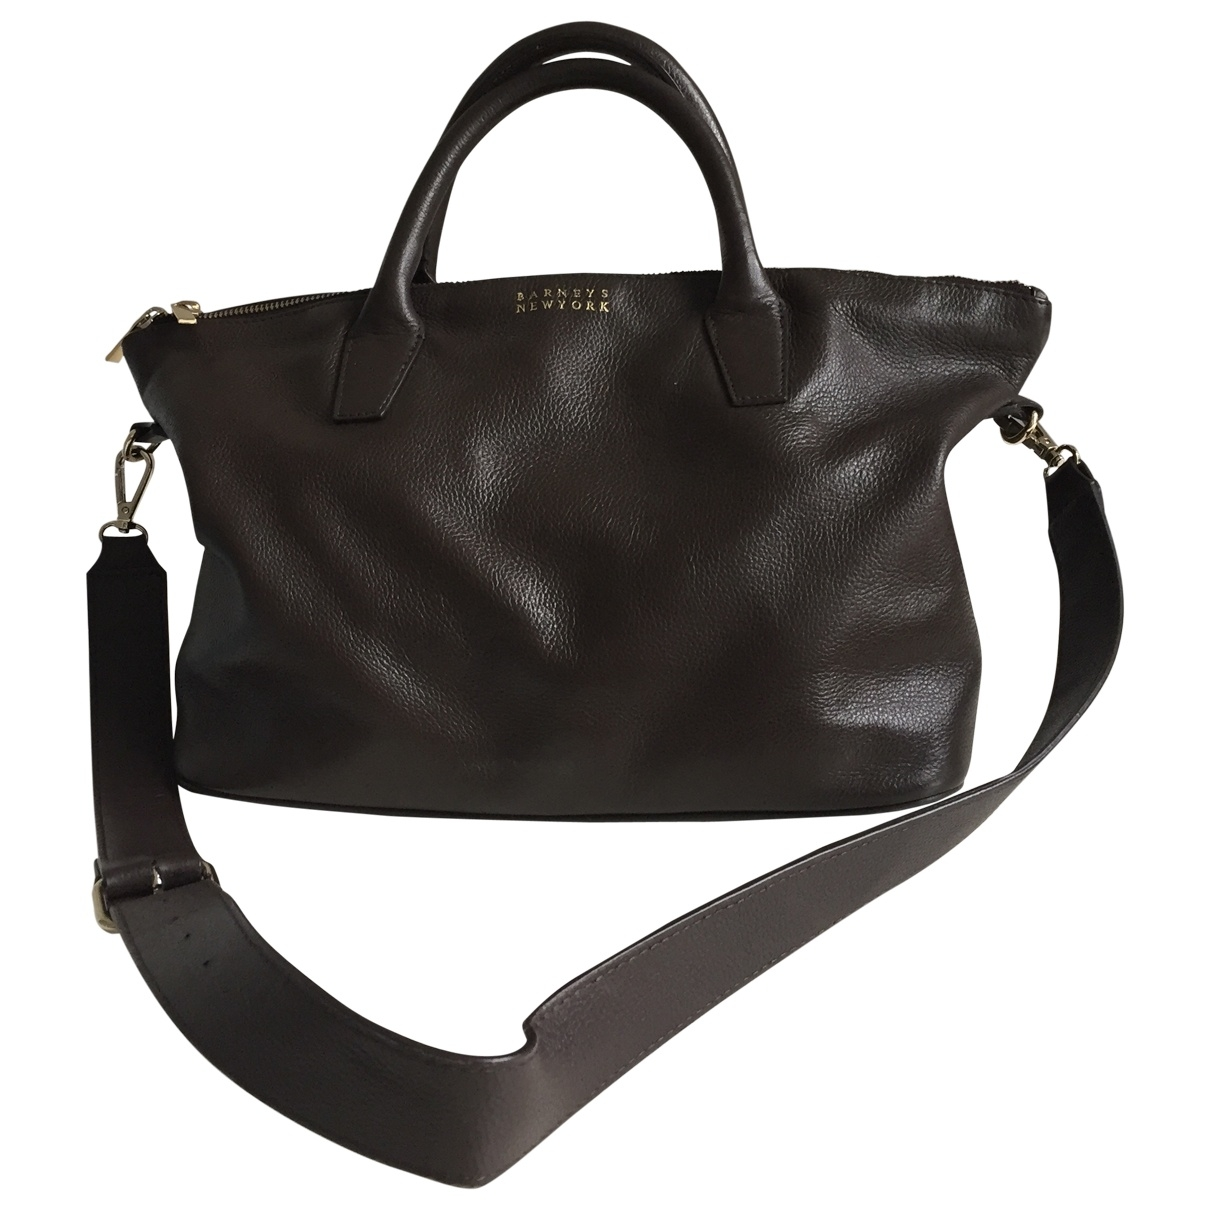 Barneys New York \N Brown Leather handbag for Women \N